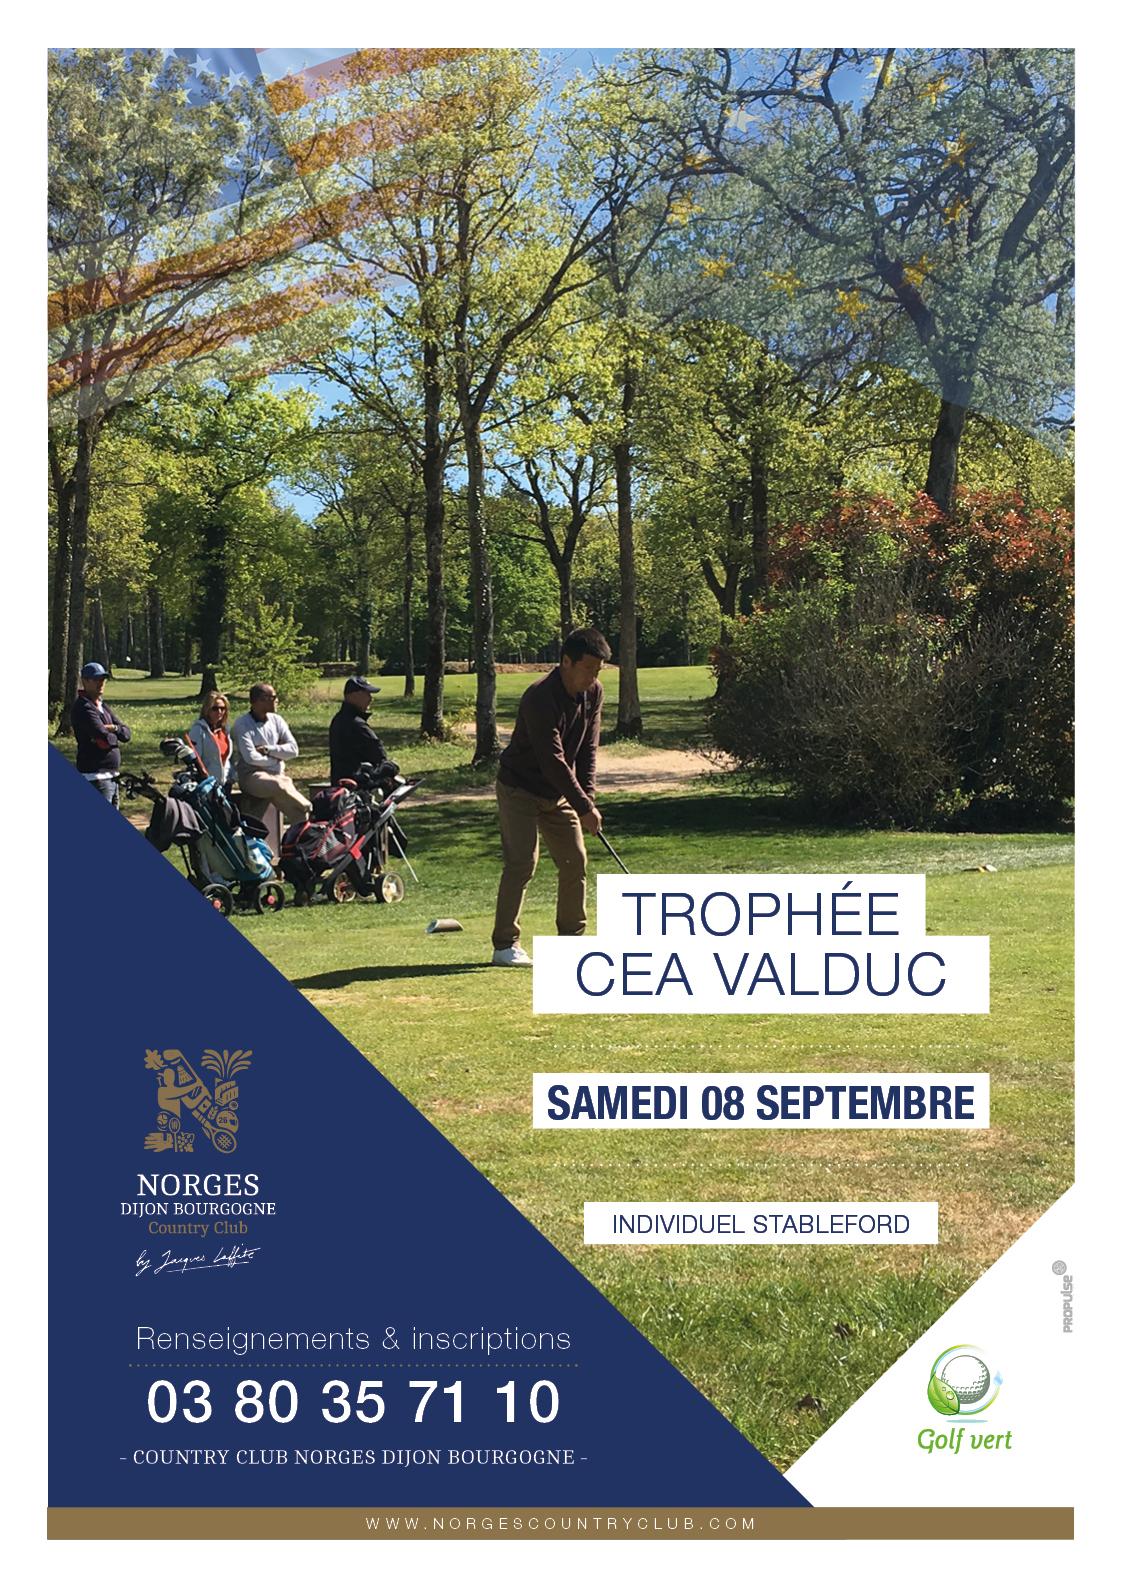 Trophée CEA Valduc